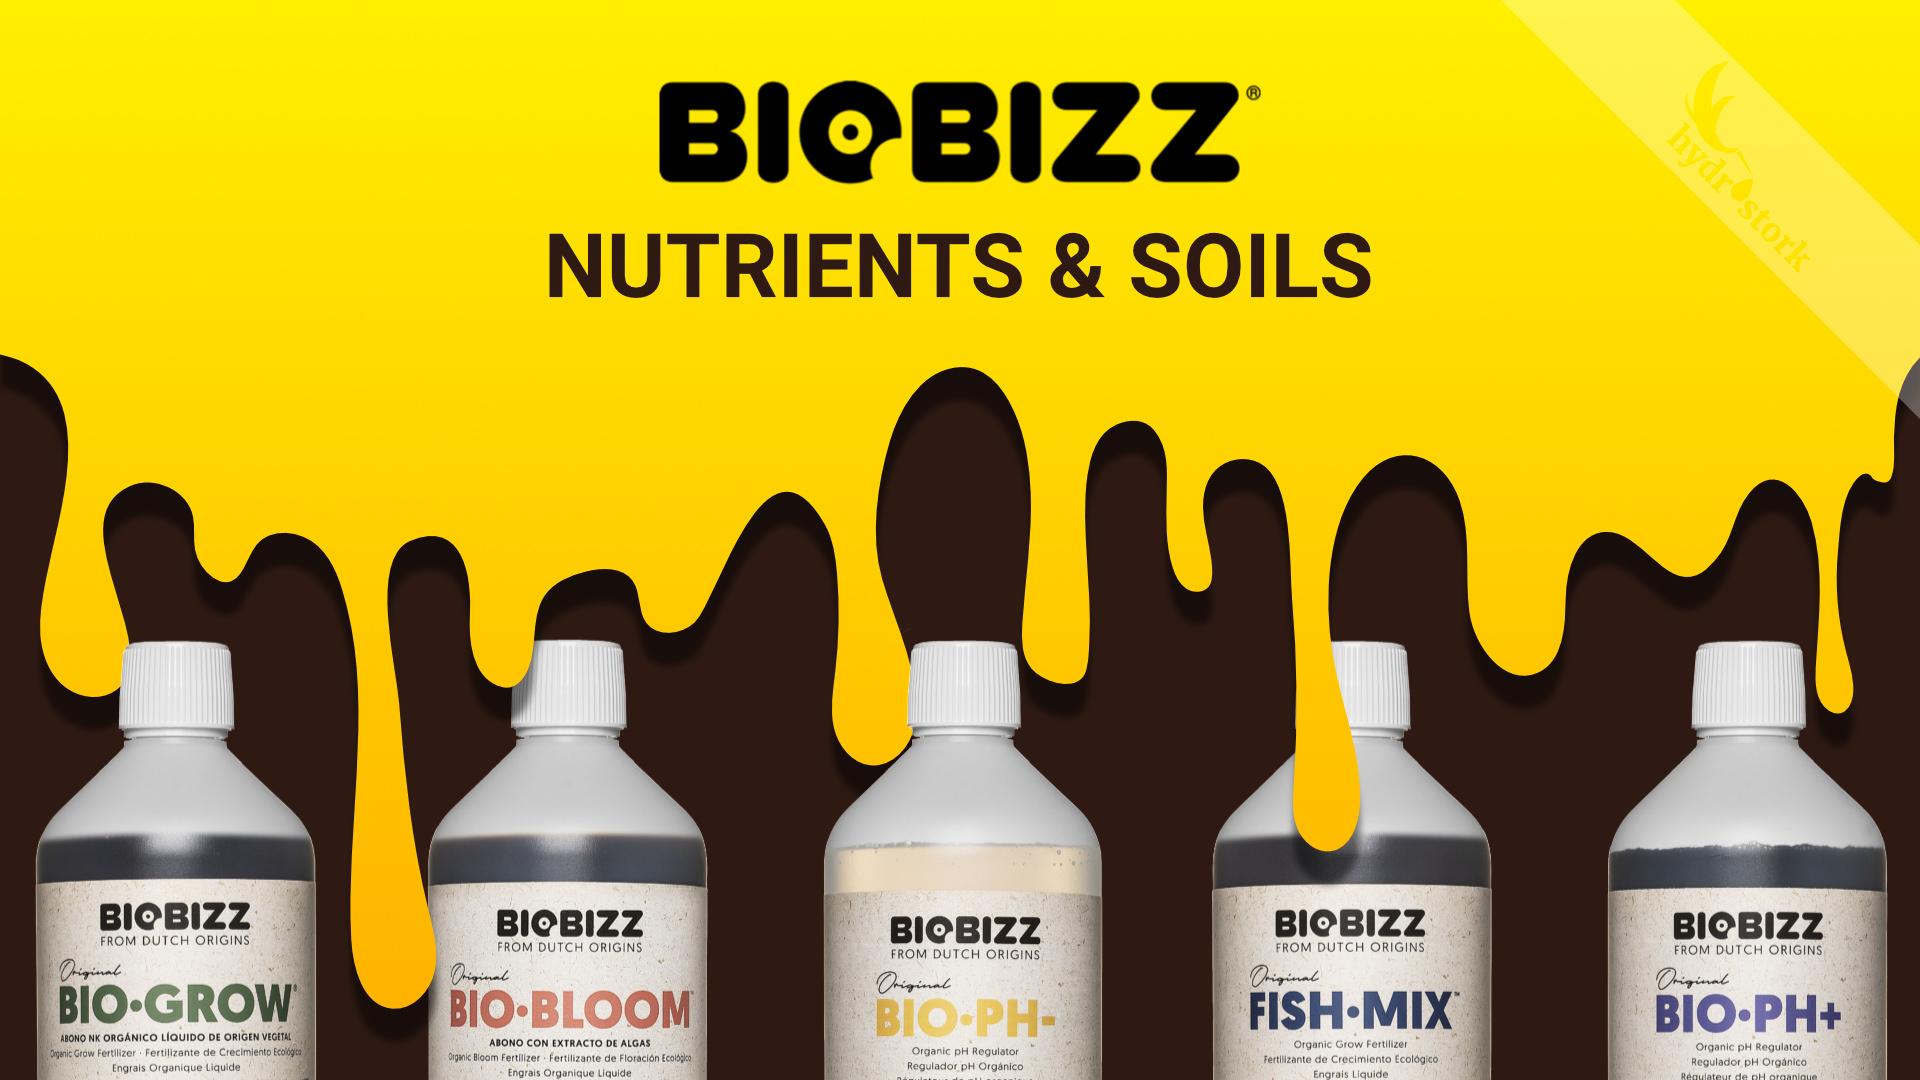 Biobizz Nutrients and Soils Guide